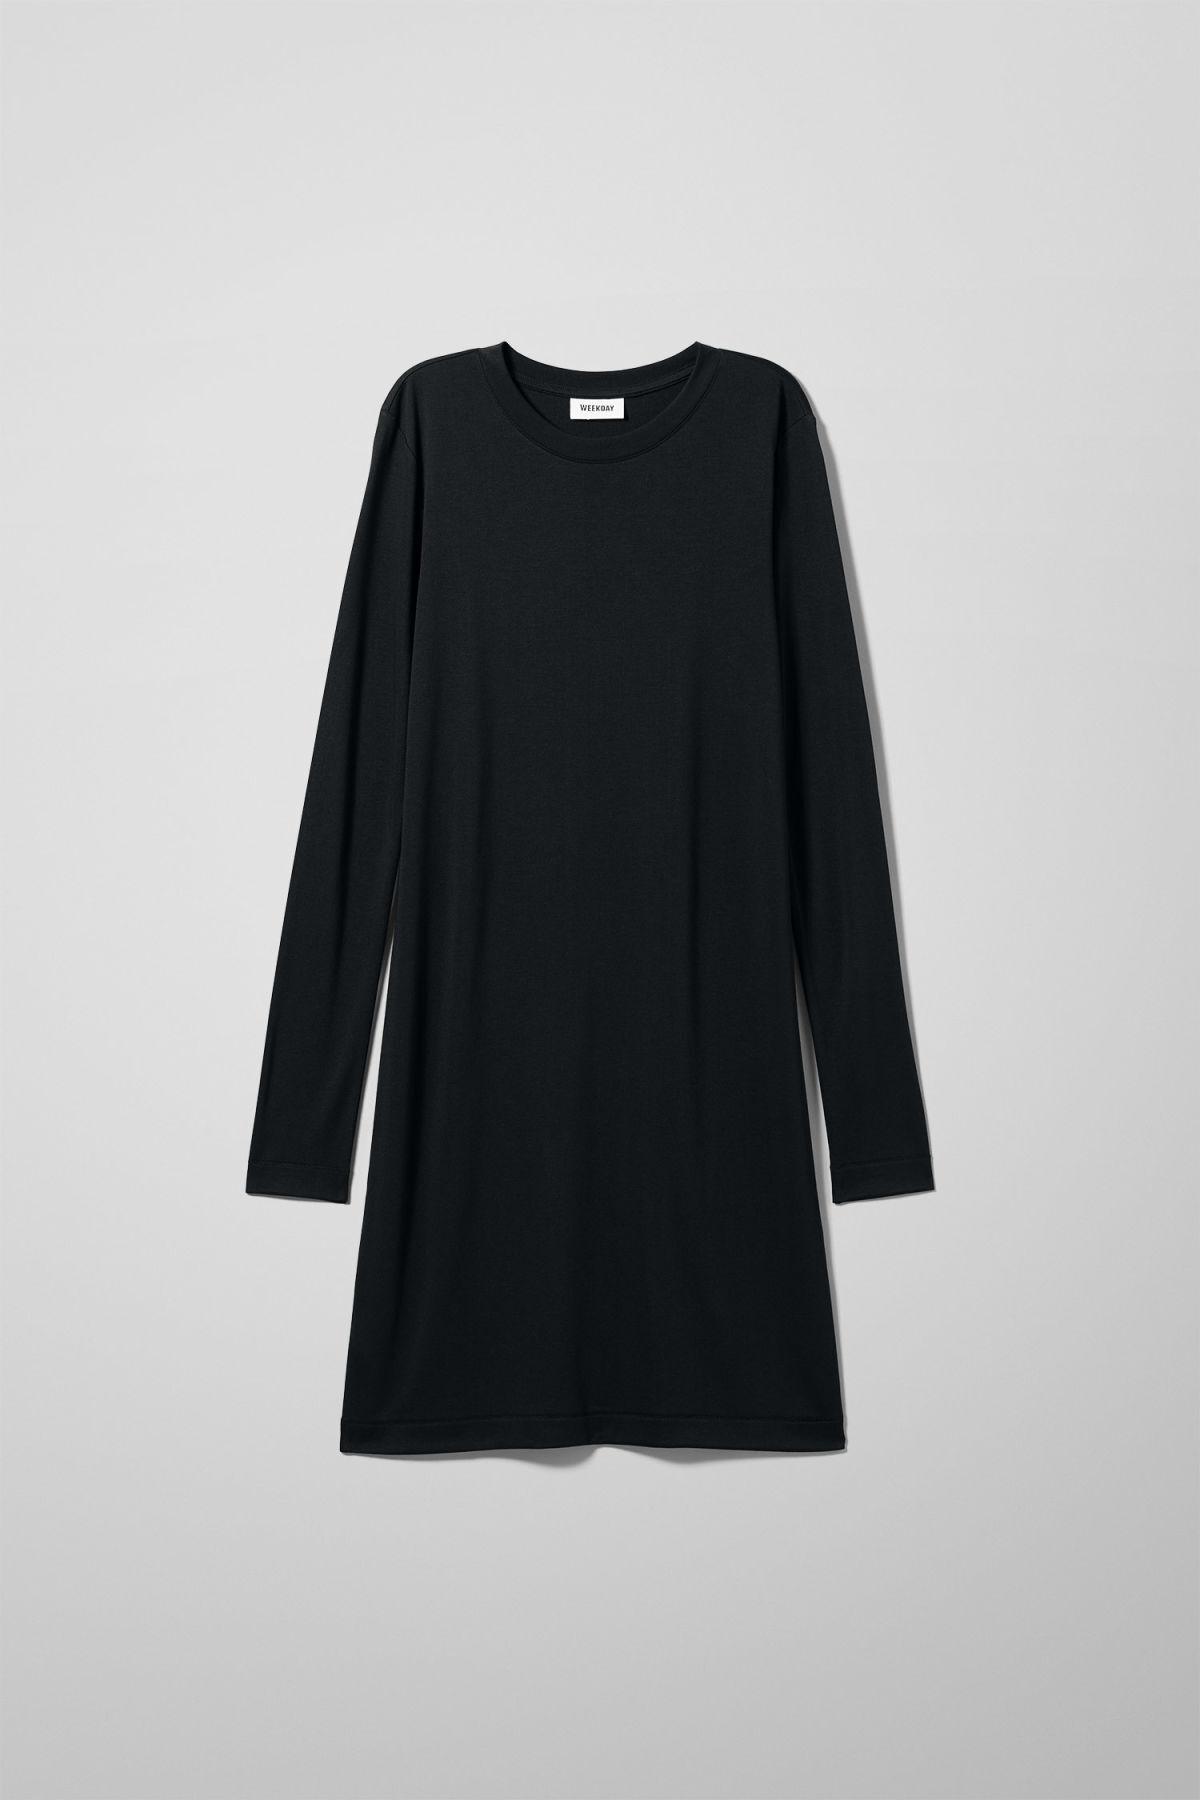 Image of Beyond Long Sleeve Dress - Black-M